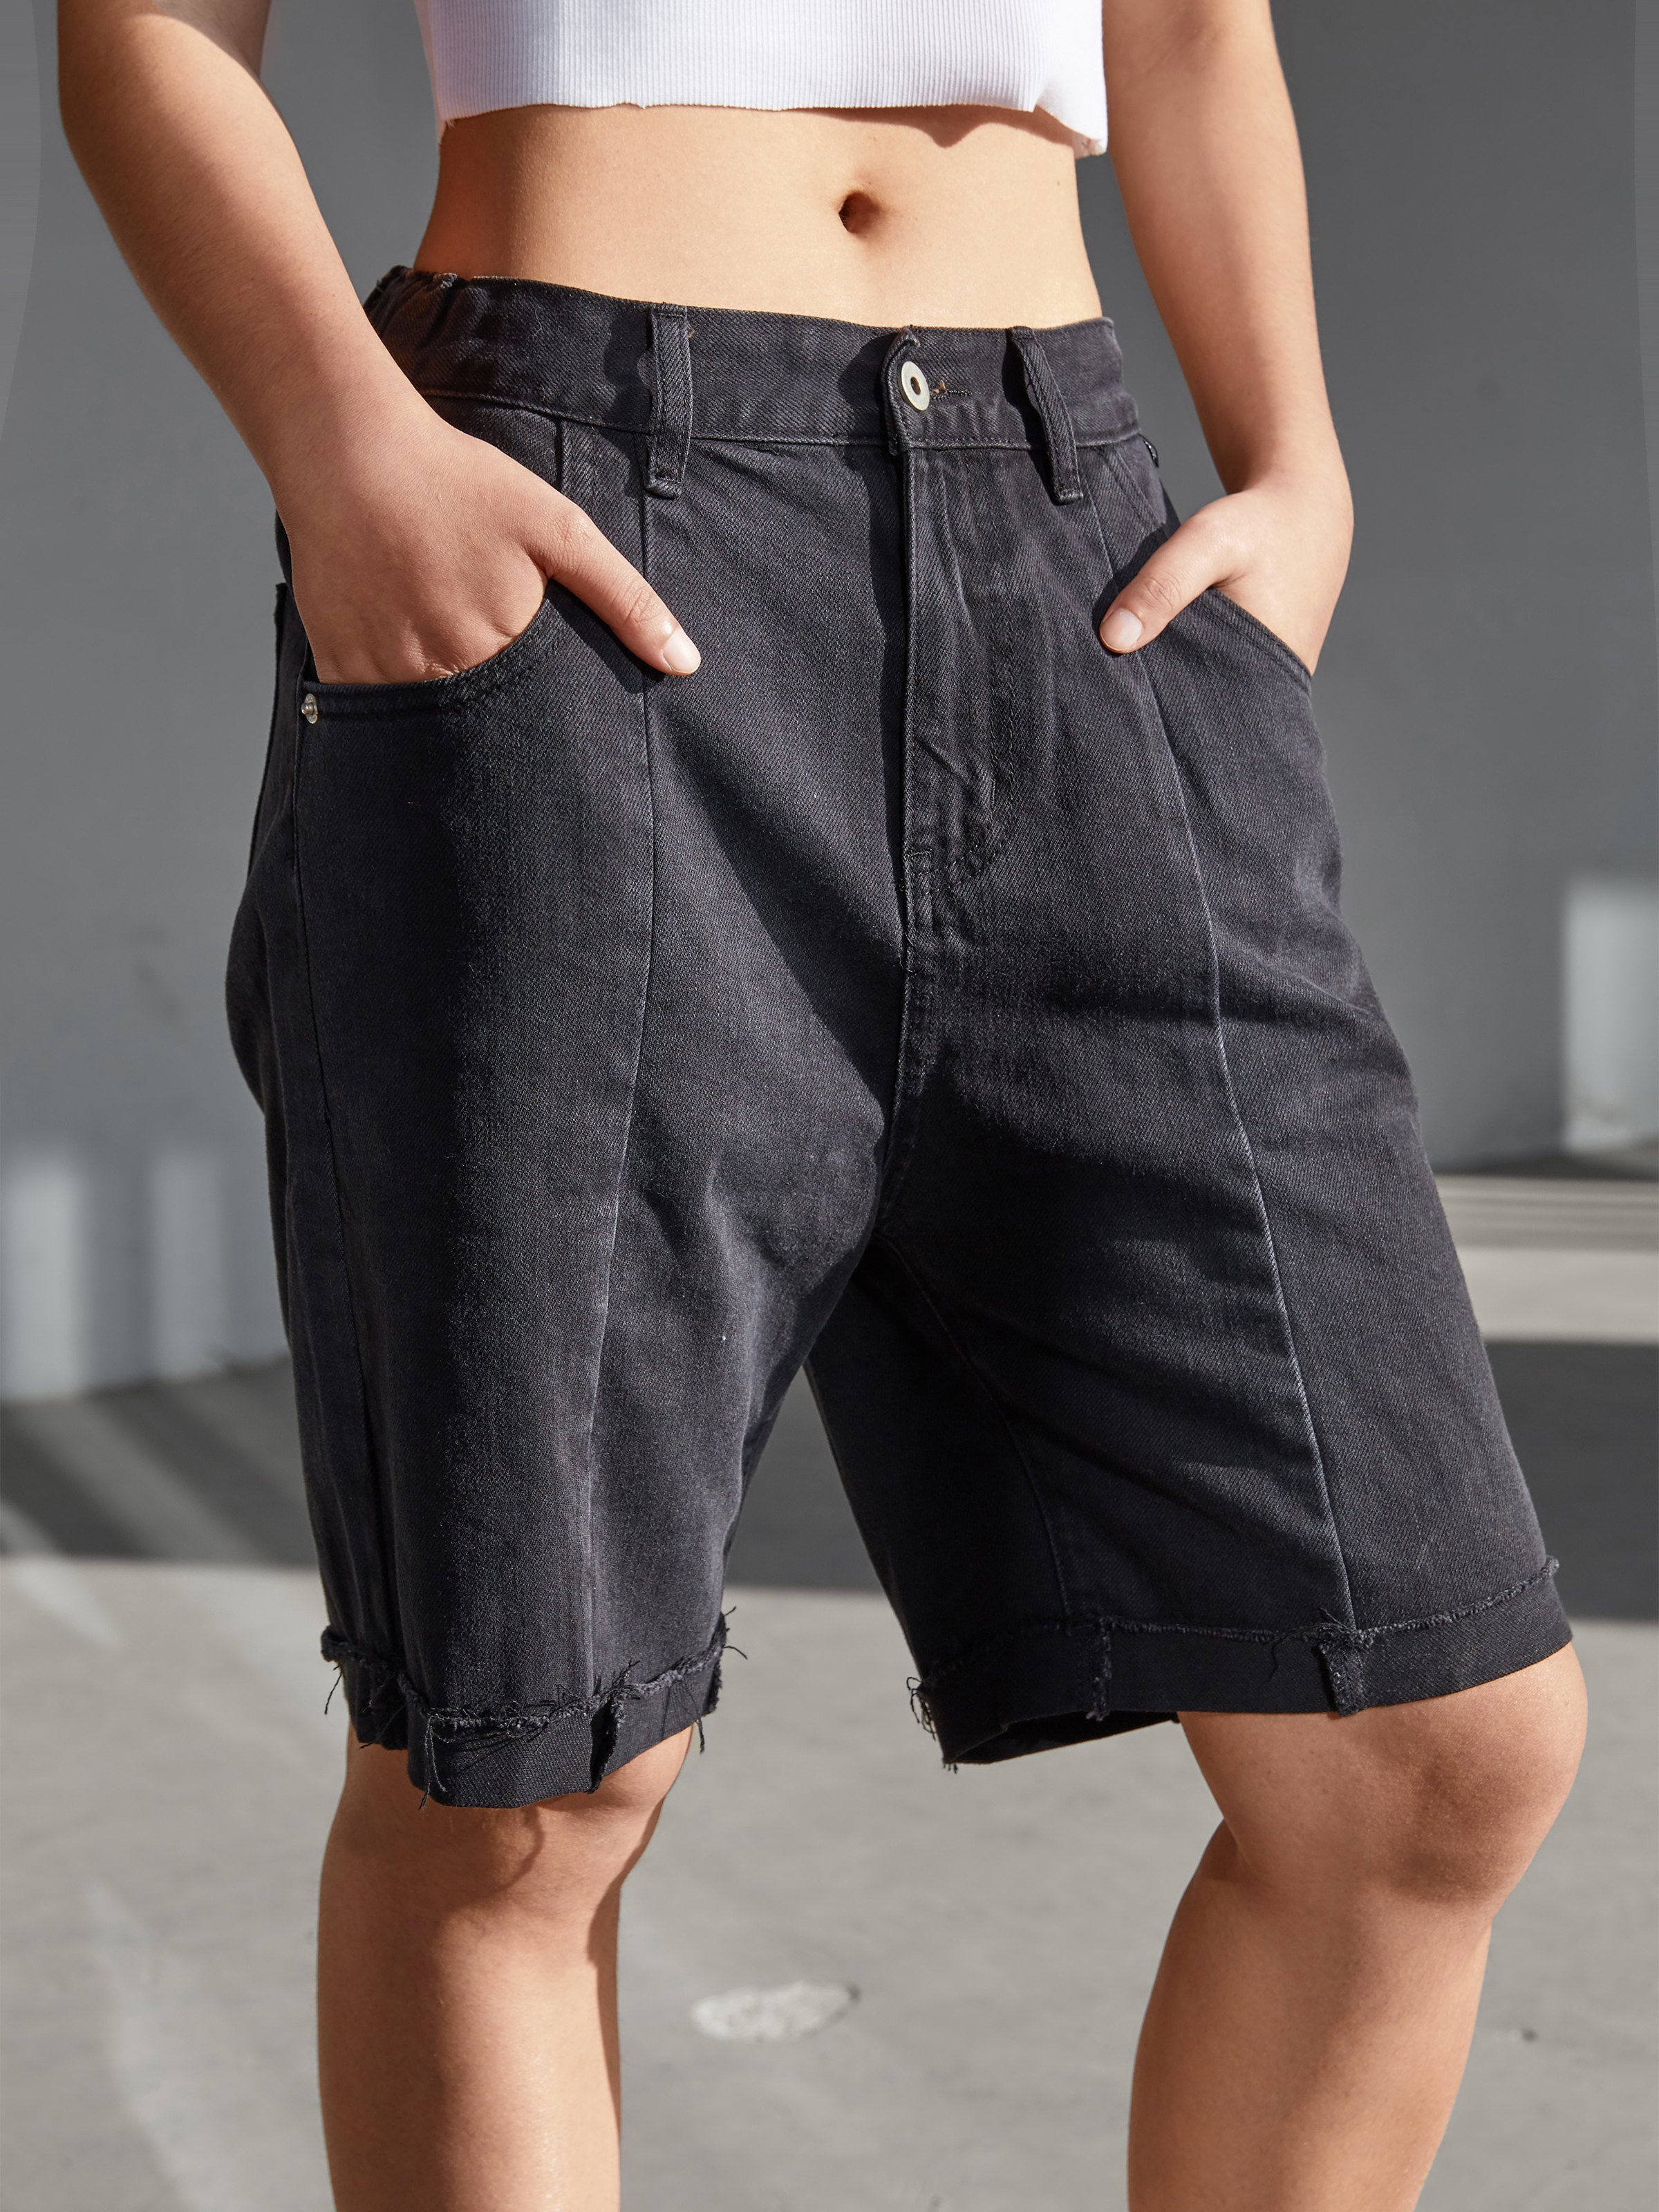 Splice High Waist Denim Shorts - Black S